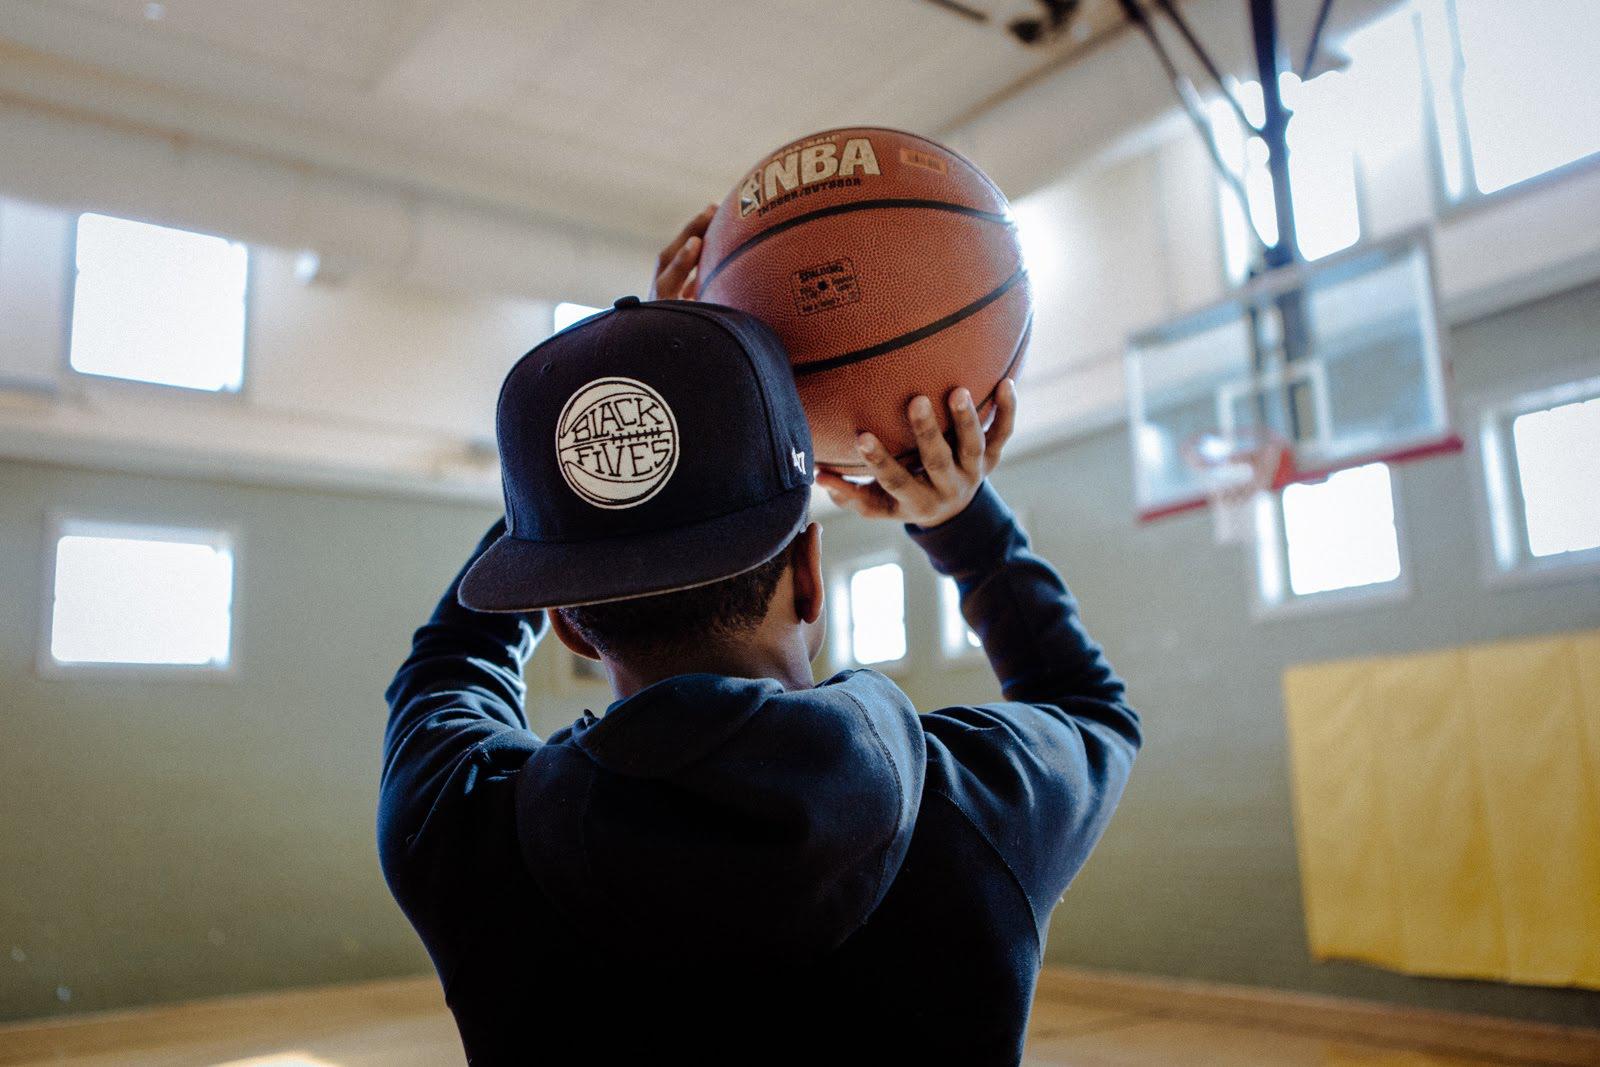 08439e2987f5b Black Fives baseball caps honor basketball pioneers